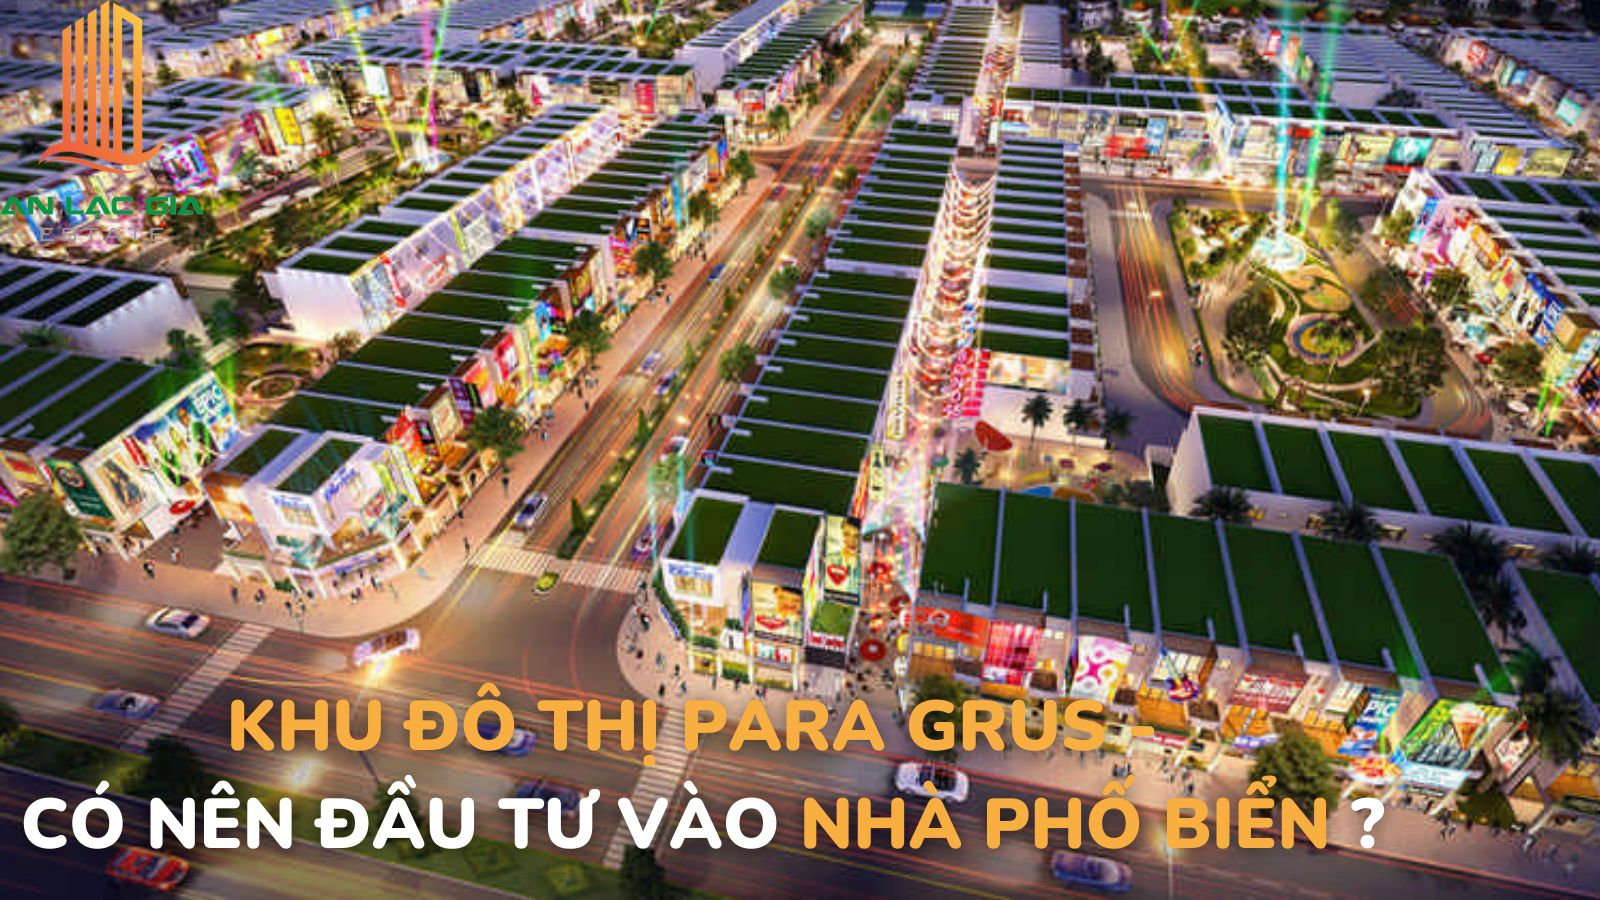 khu-do-thi-para-grus-co-nen-dau-tu-vao-nha-pho-bien